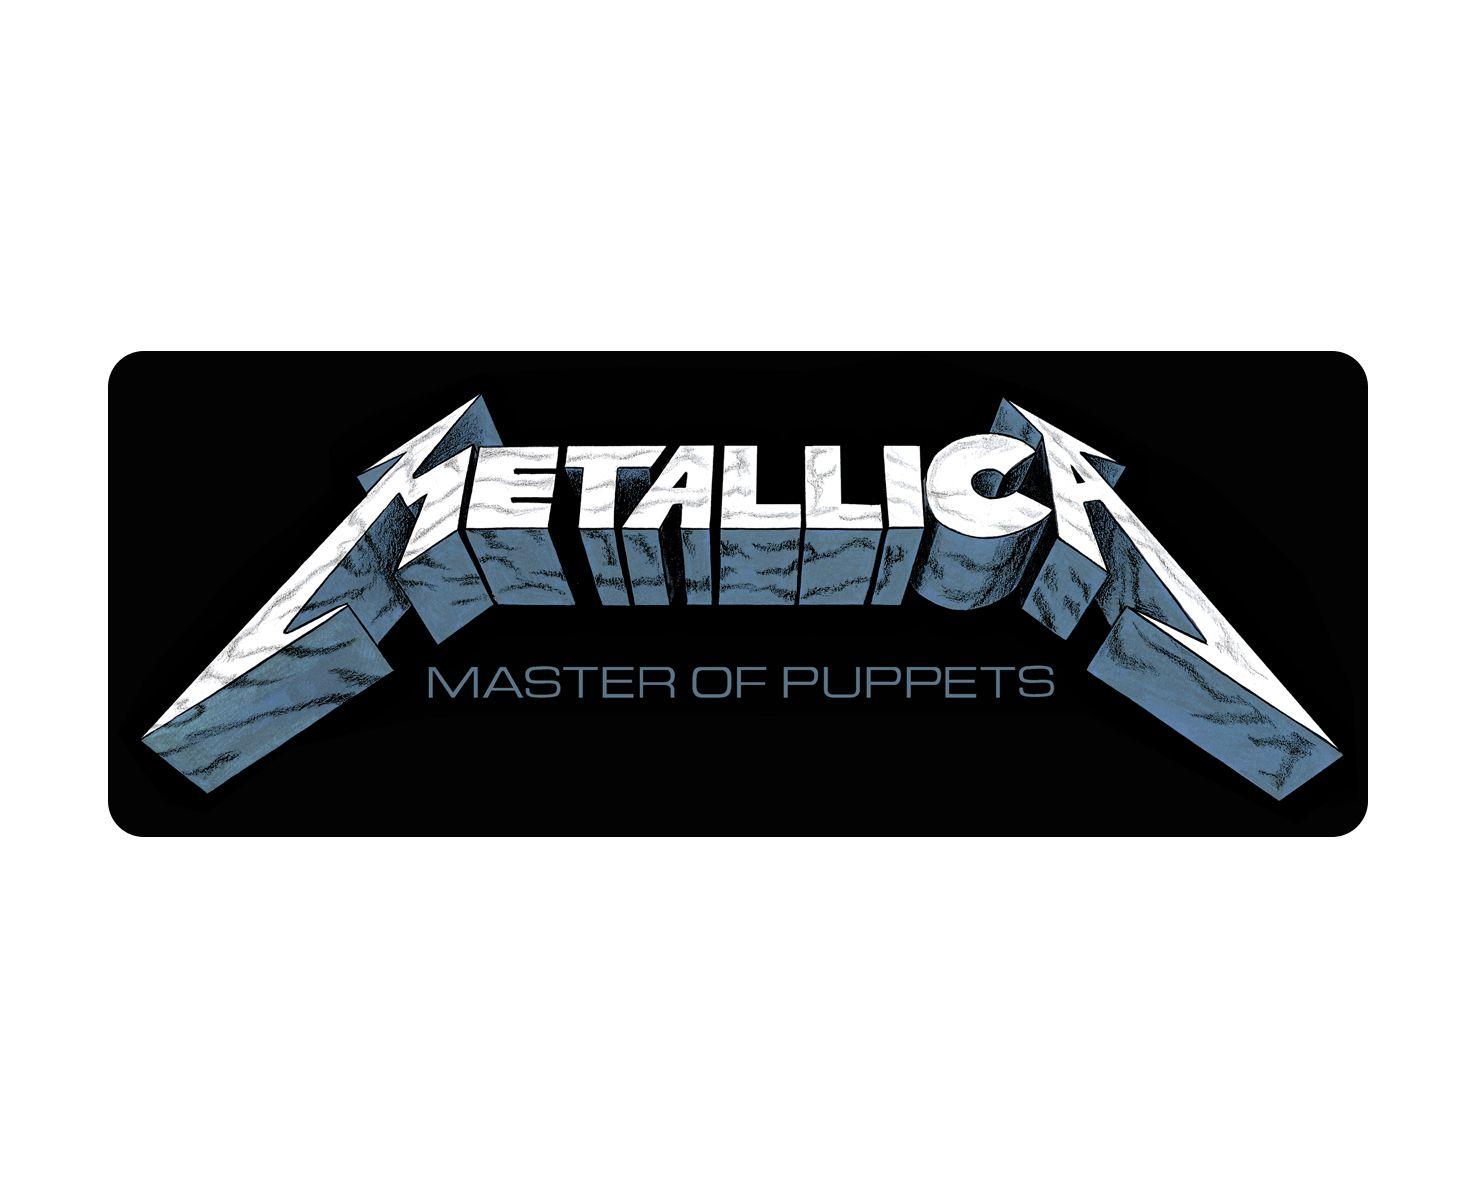 Metallica - Master Of Puppets [Adesivo]